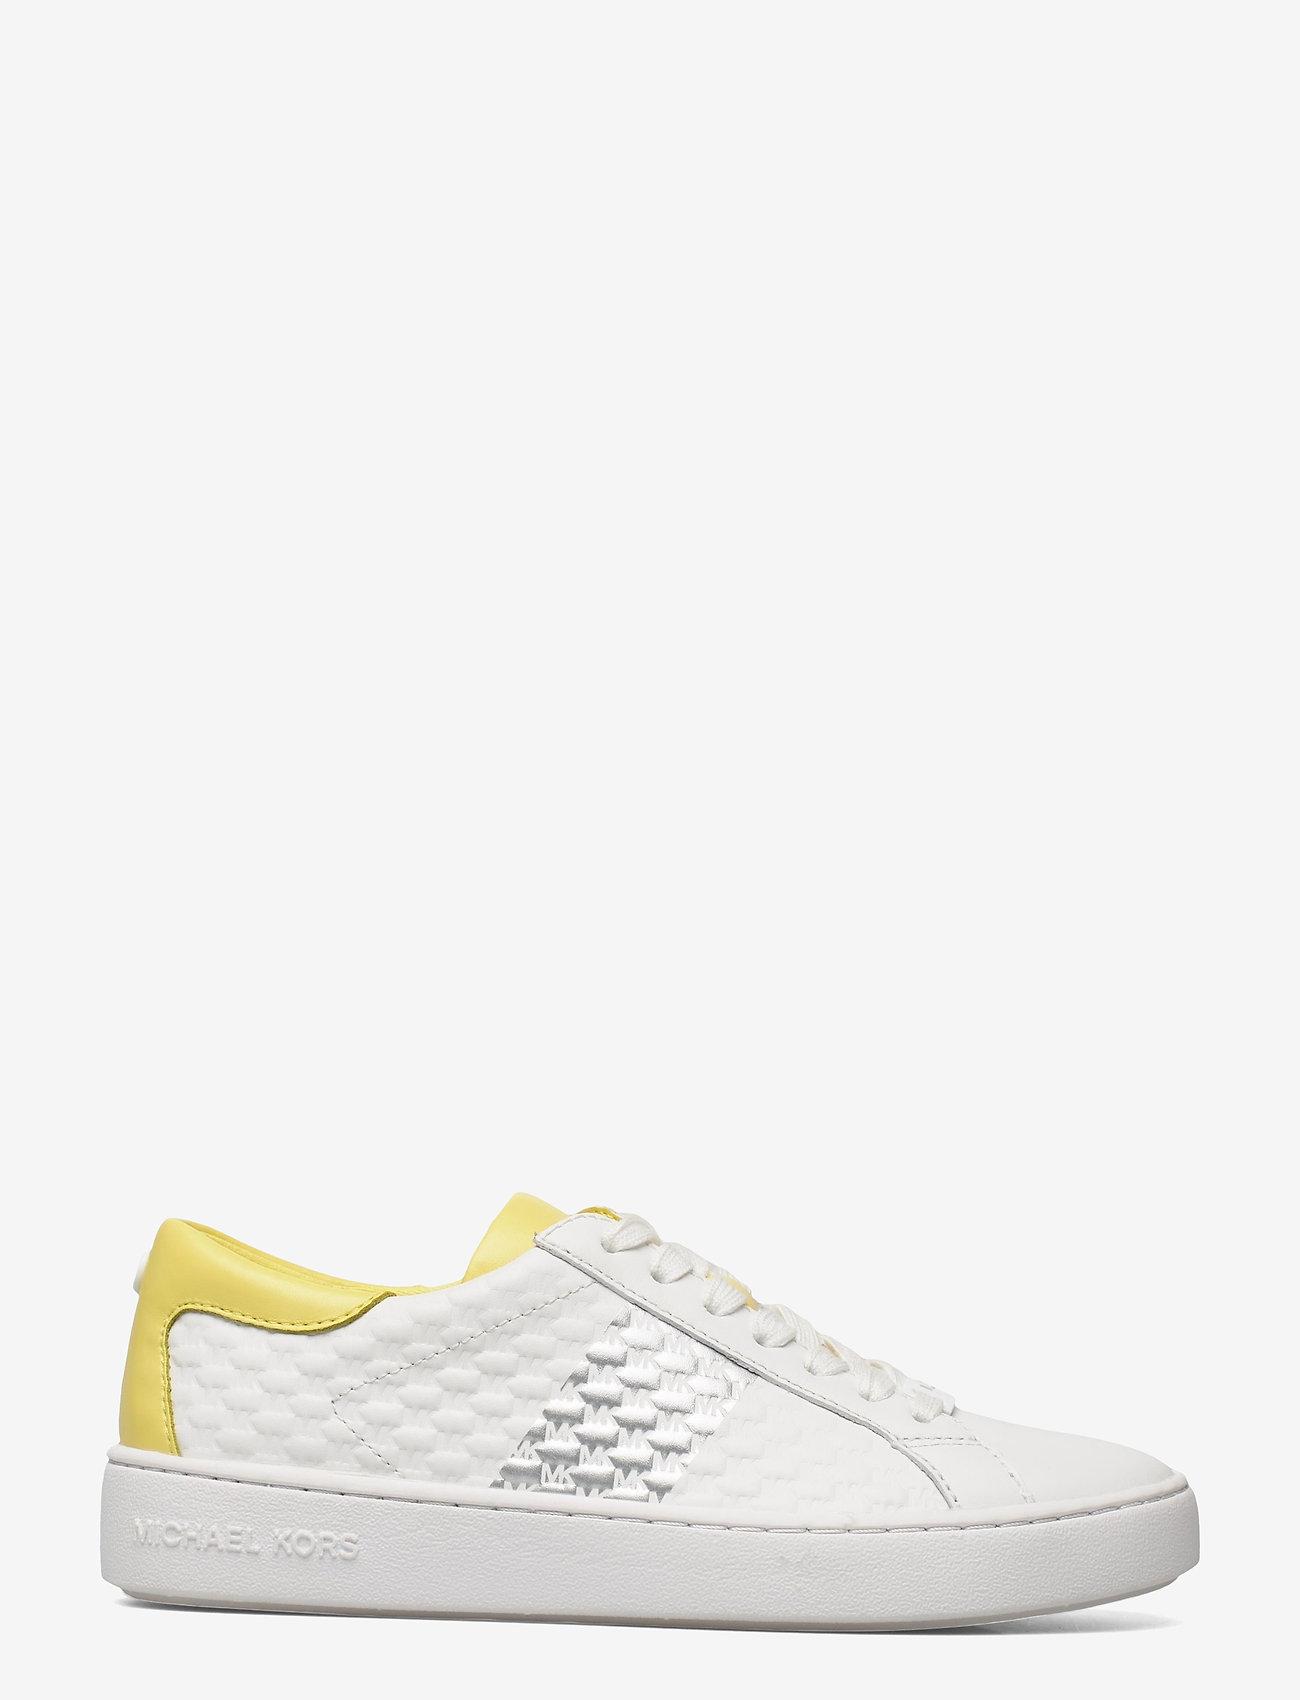 Michael Kors - COLBY SNEAKER - lage sneakers - limelight - 1